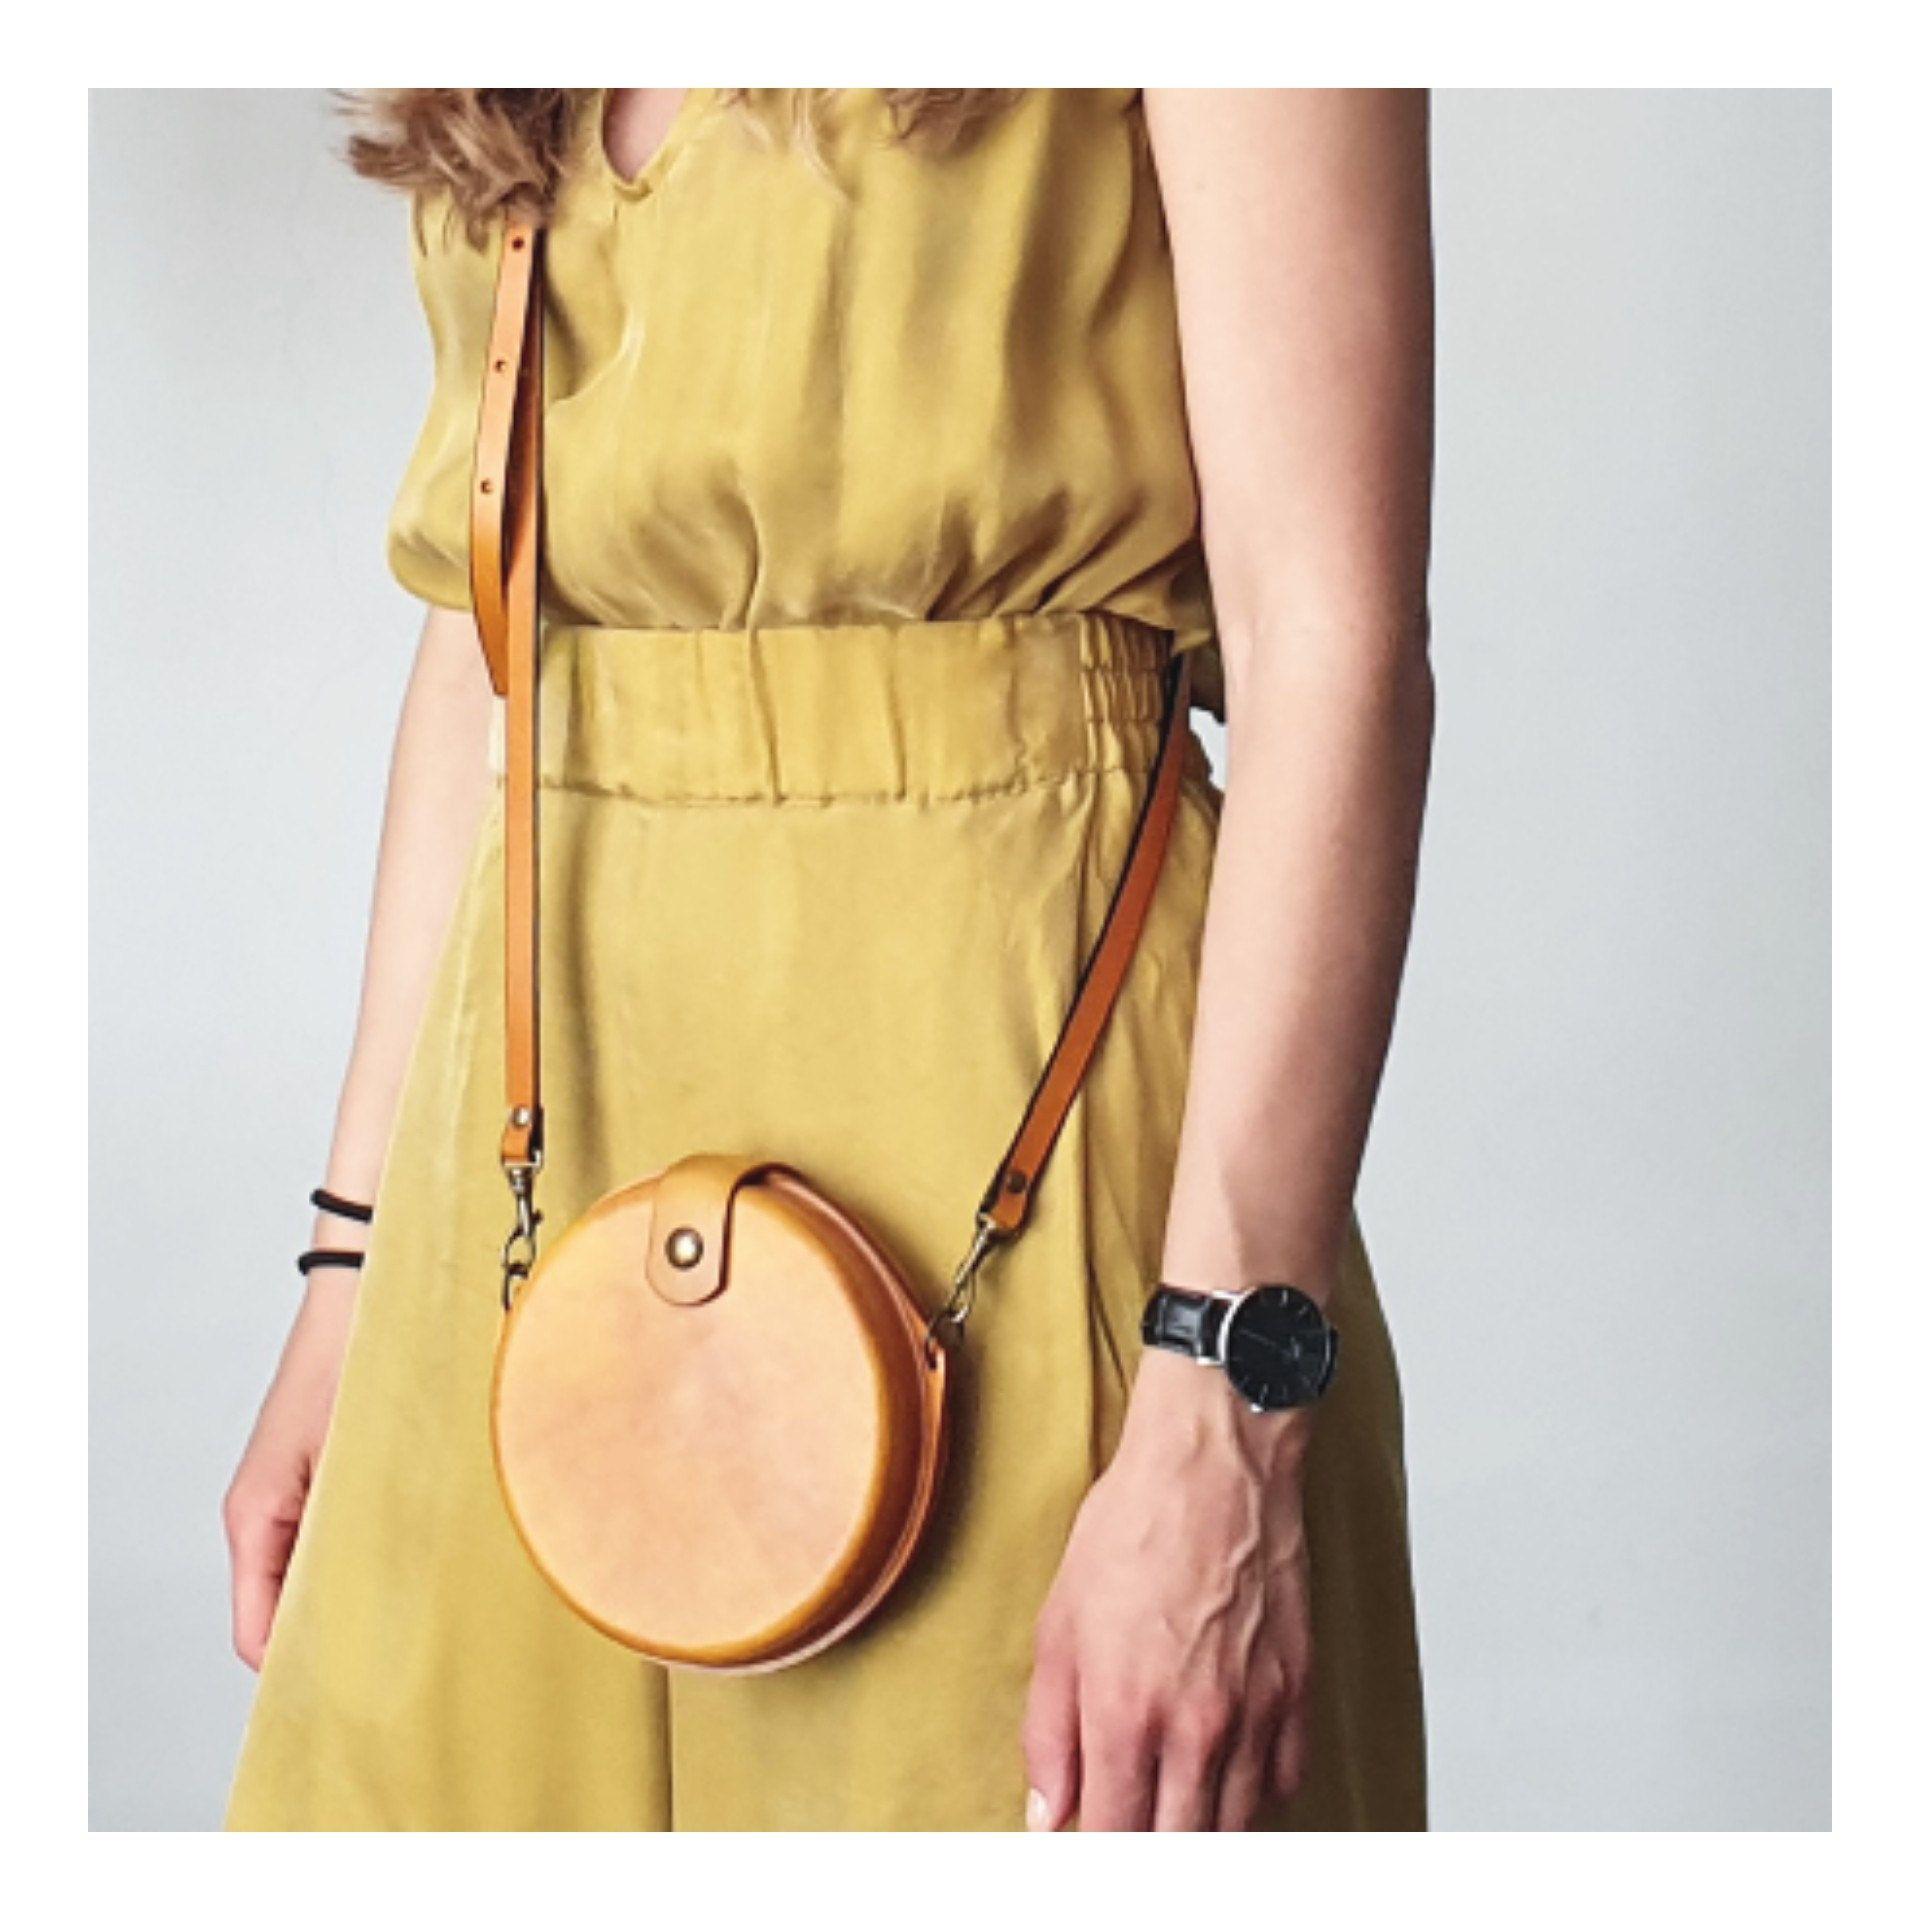 Round Leather Purse Bag Sale Crossbody Leather Bag Women Etsy Leather Bag Women Leather Purses Leather Bag